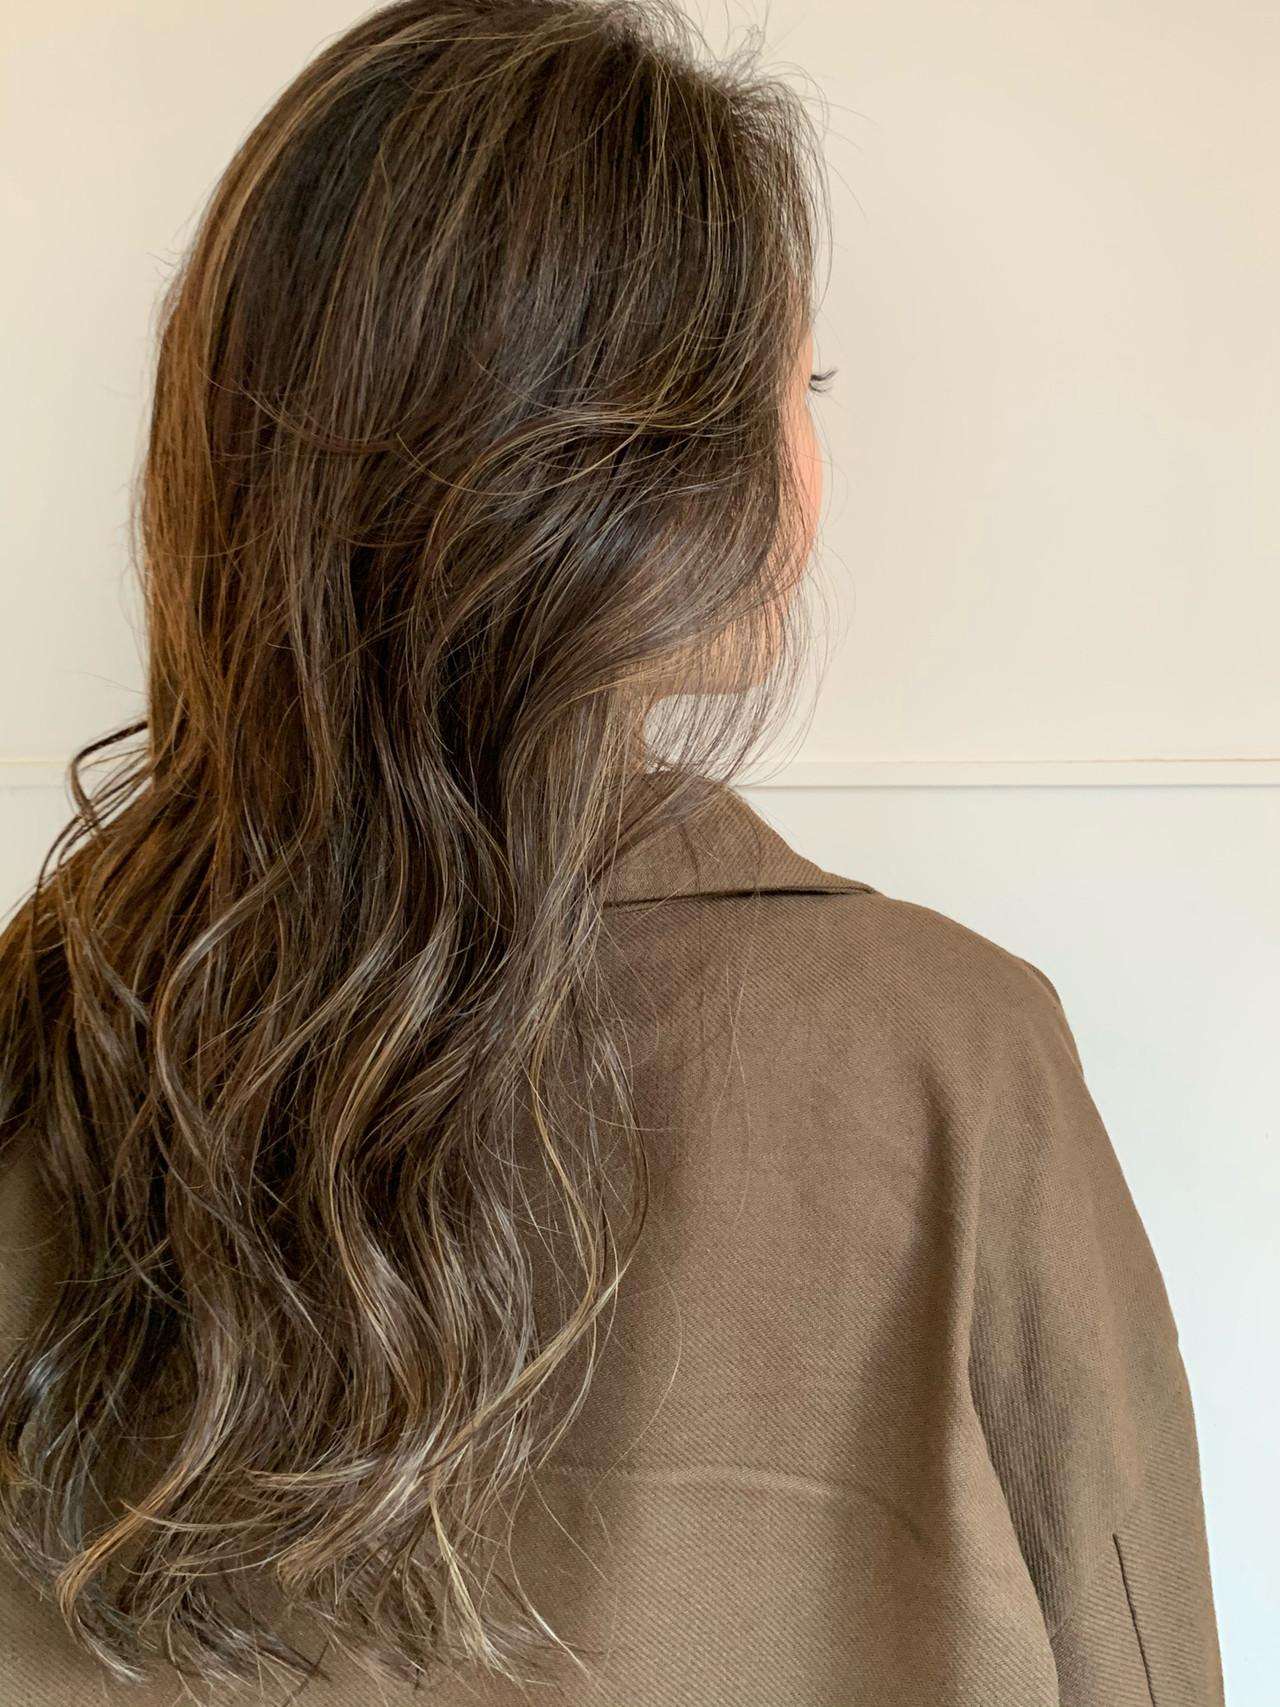 3Dカラー 寒色 ハイライト ロング ヘアスタイルや髪型の写真・画像